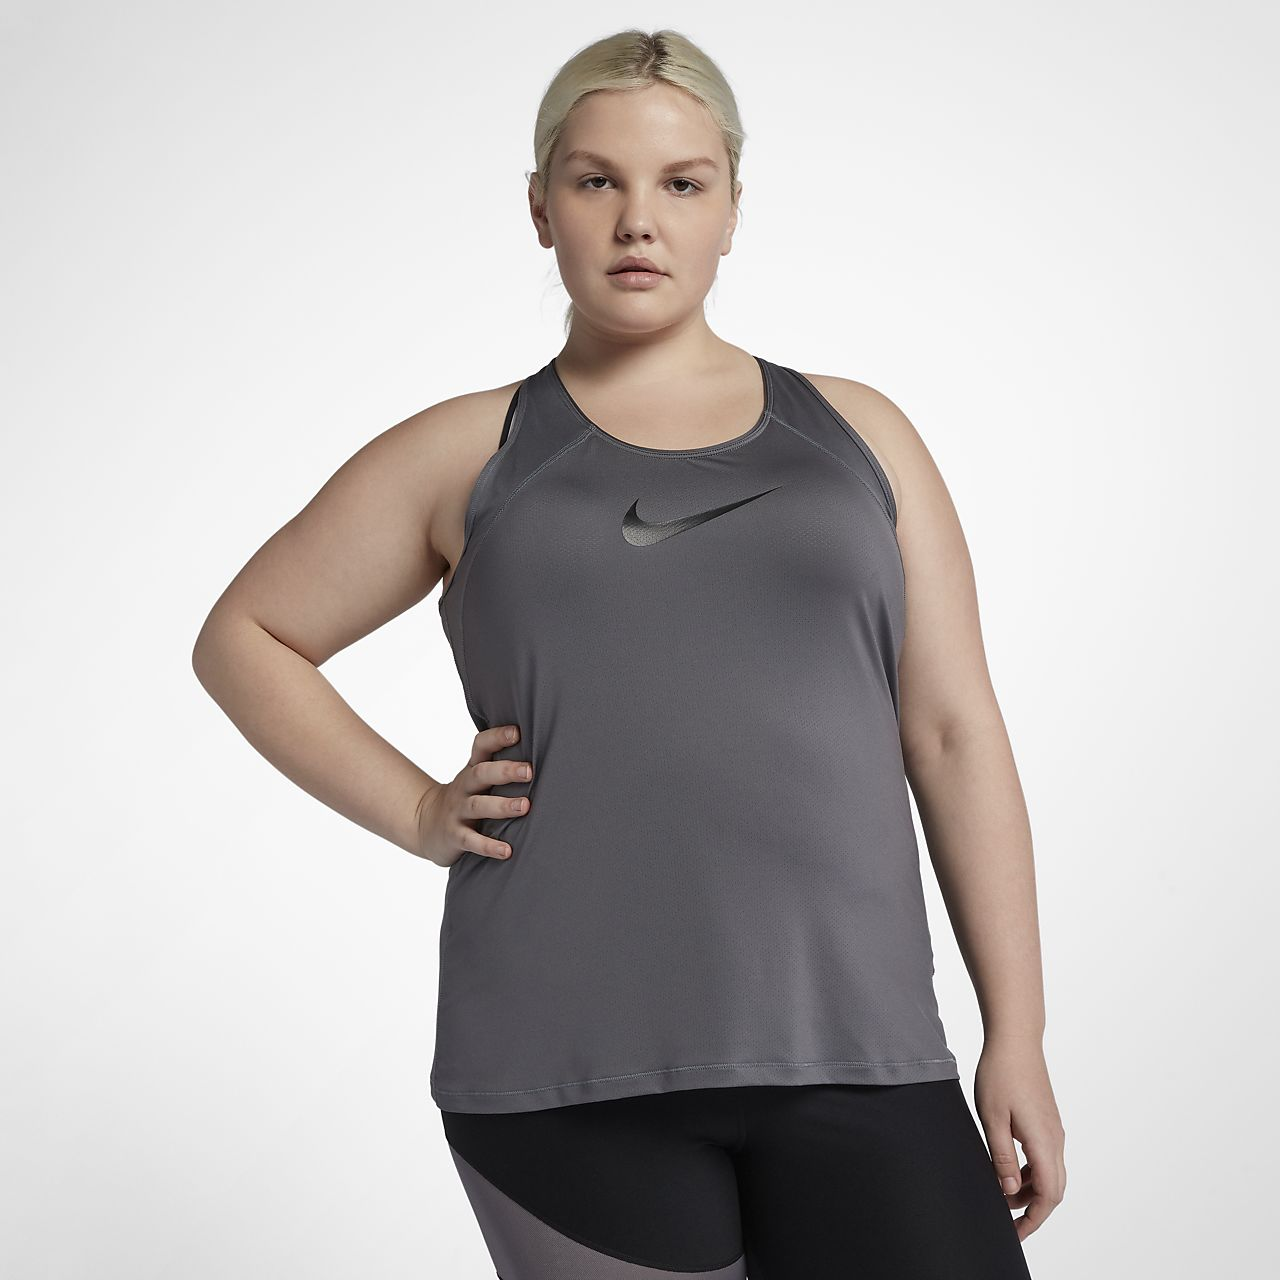 Nike Pro Trainings-Tanktop für Damen (große Größe)